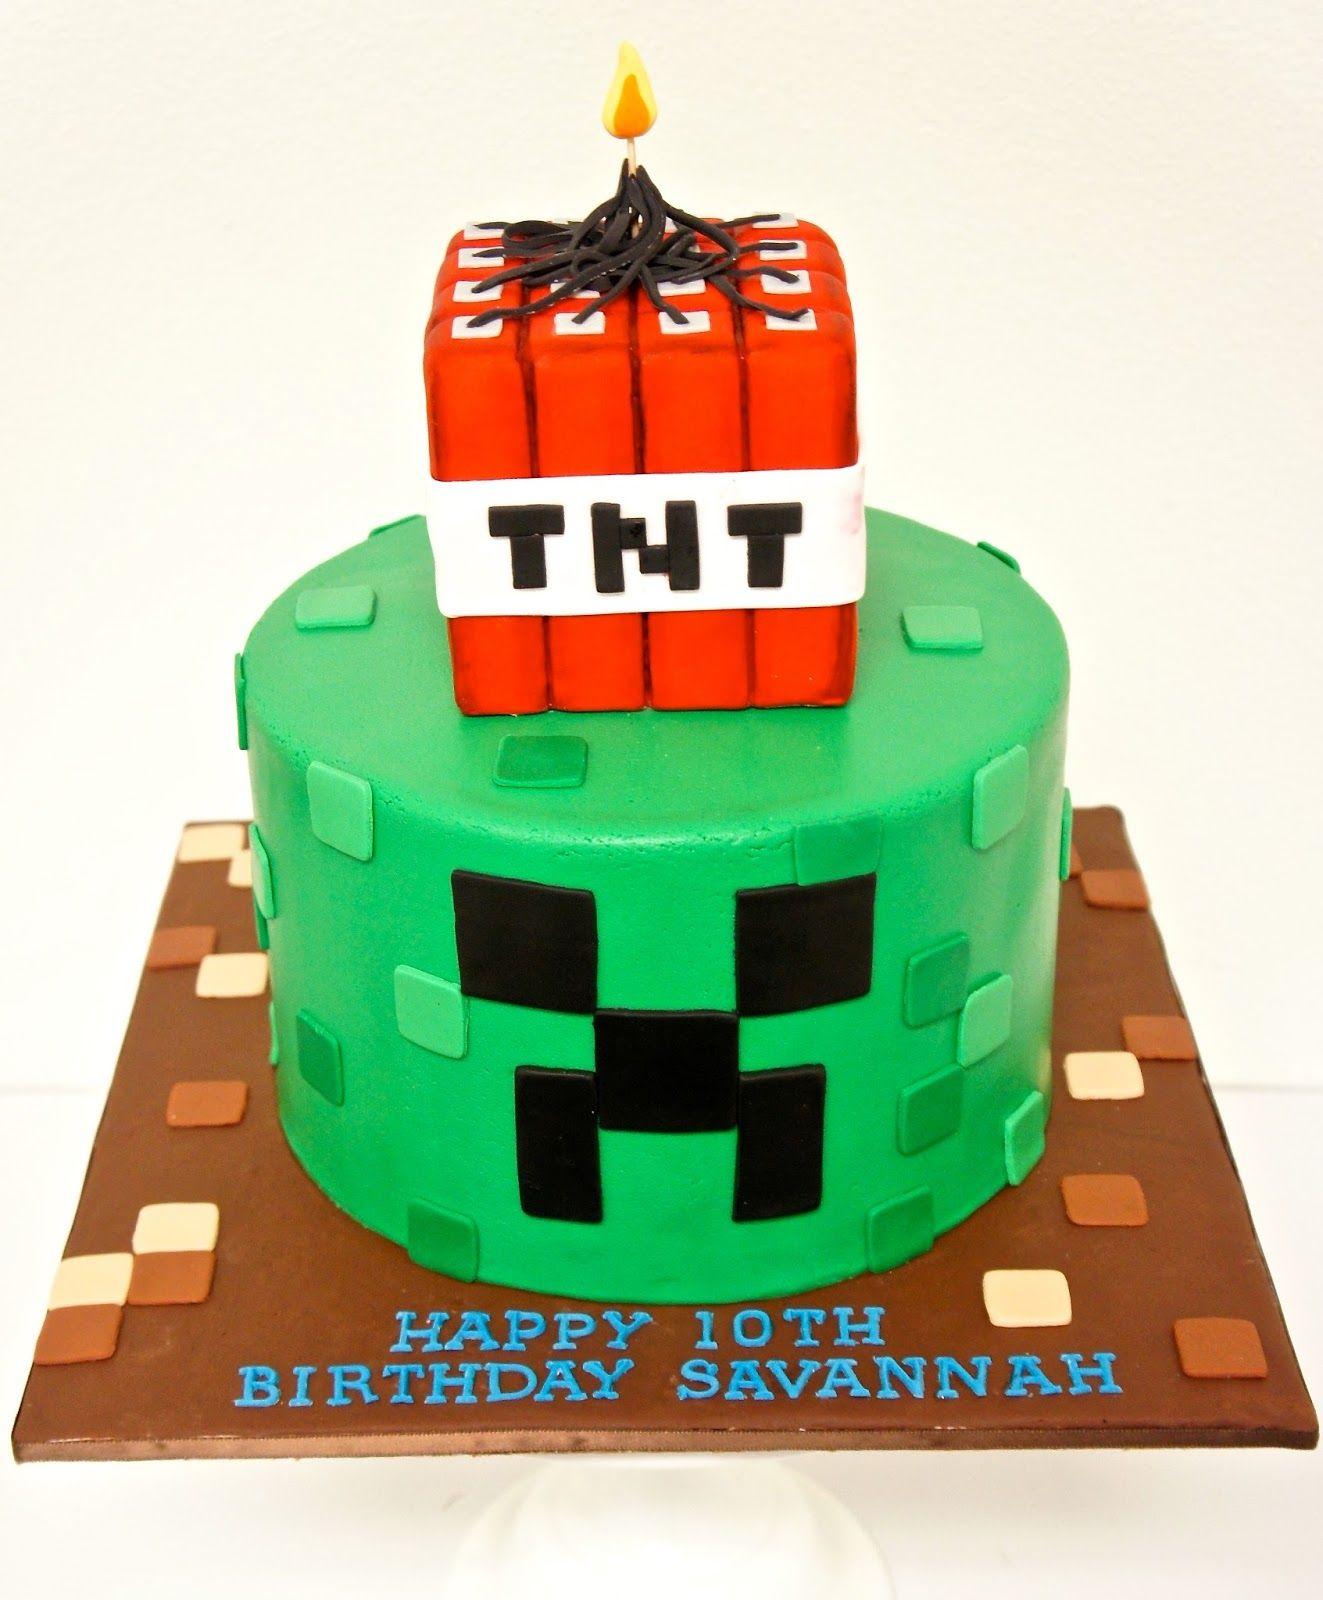 Gâteau – Le Minecraft Wiki officiel